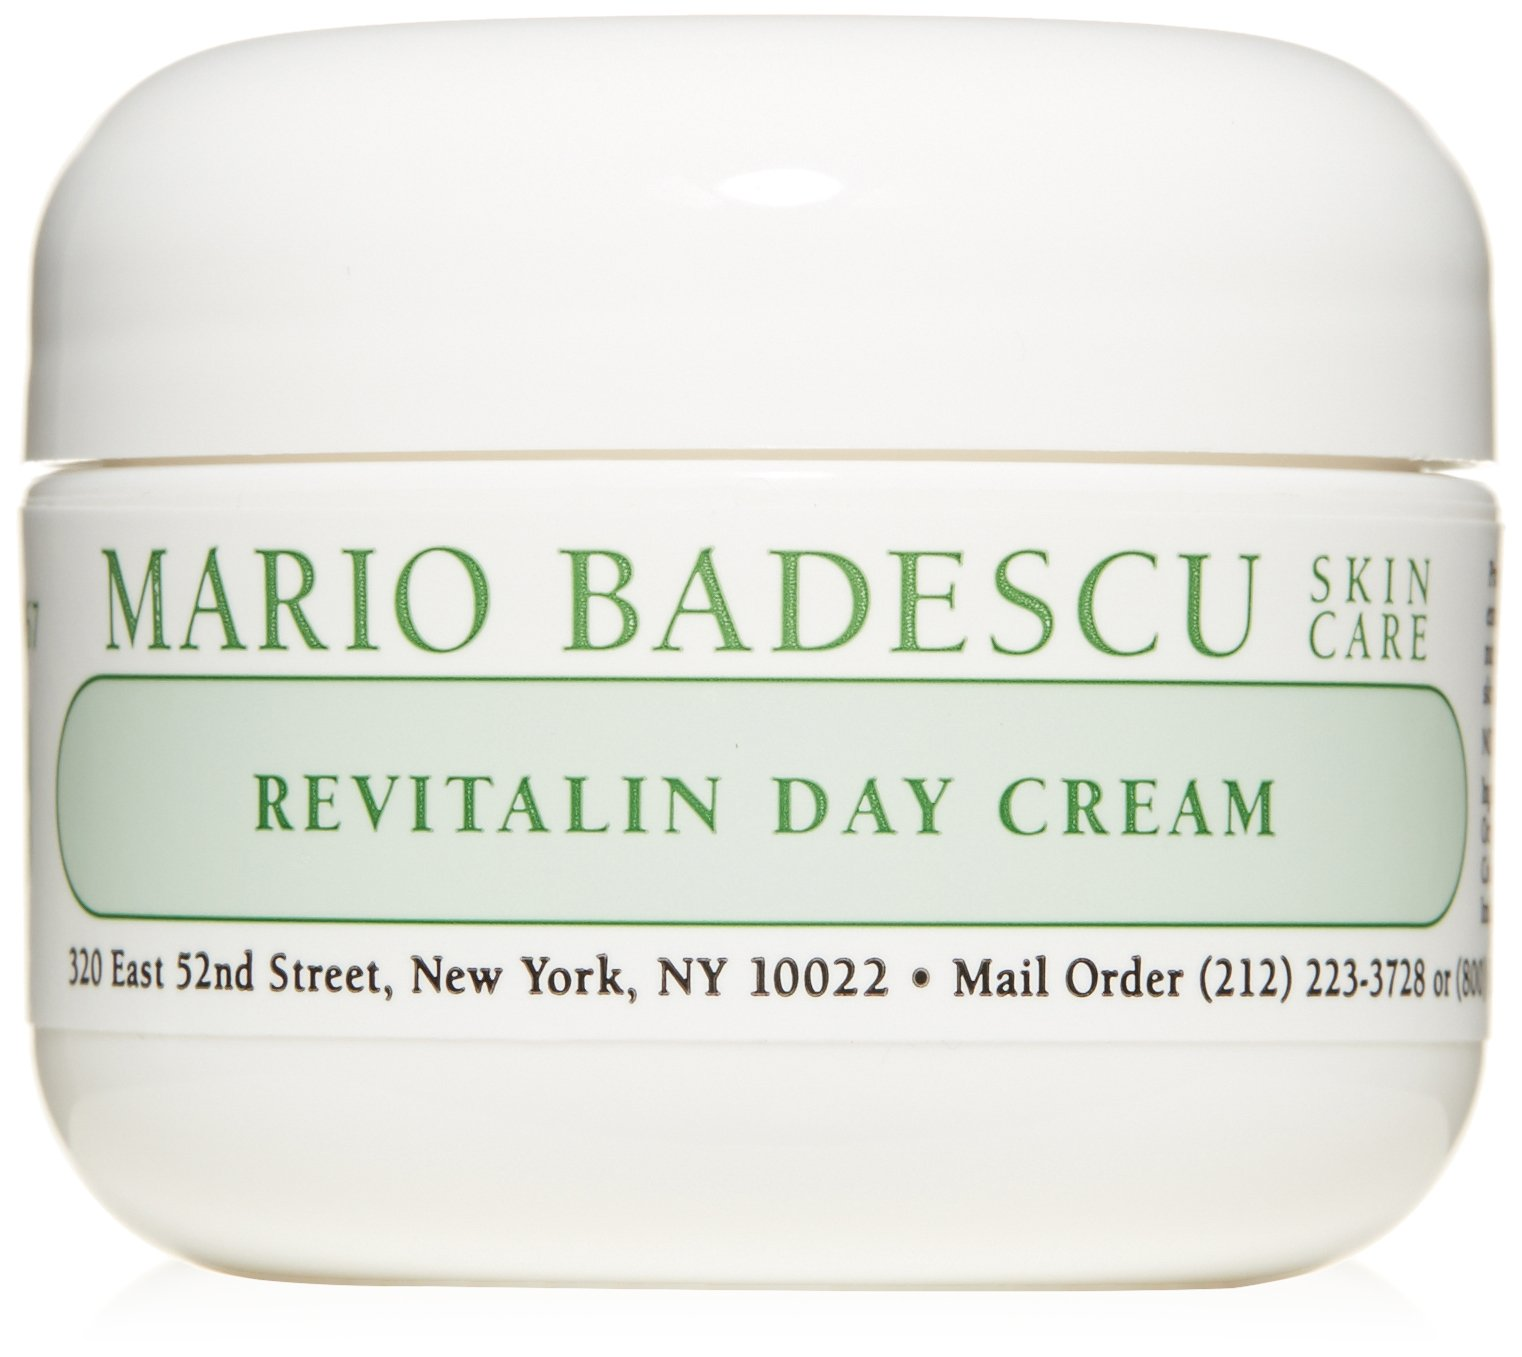 Revitalin Day Cream - For Dry/ Sensitive Skin Types 1oz Crescent White Hydra Bright Essence Makeup SPF 30 - #4C0 Cool Cashmere 1oz